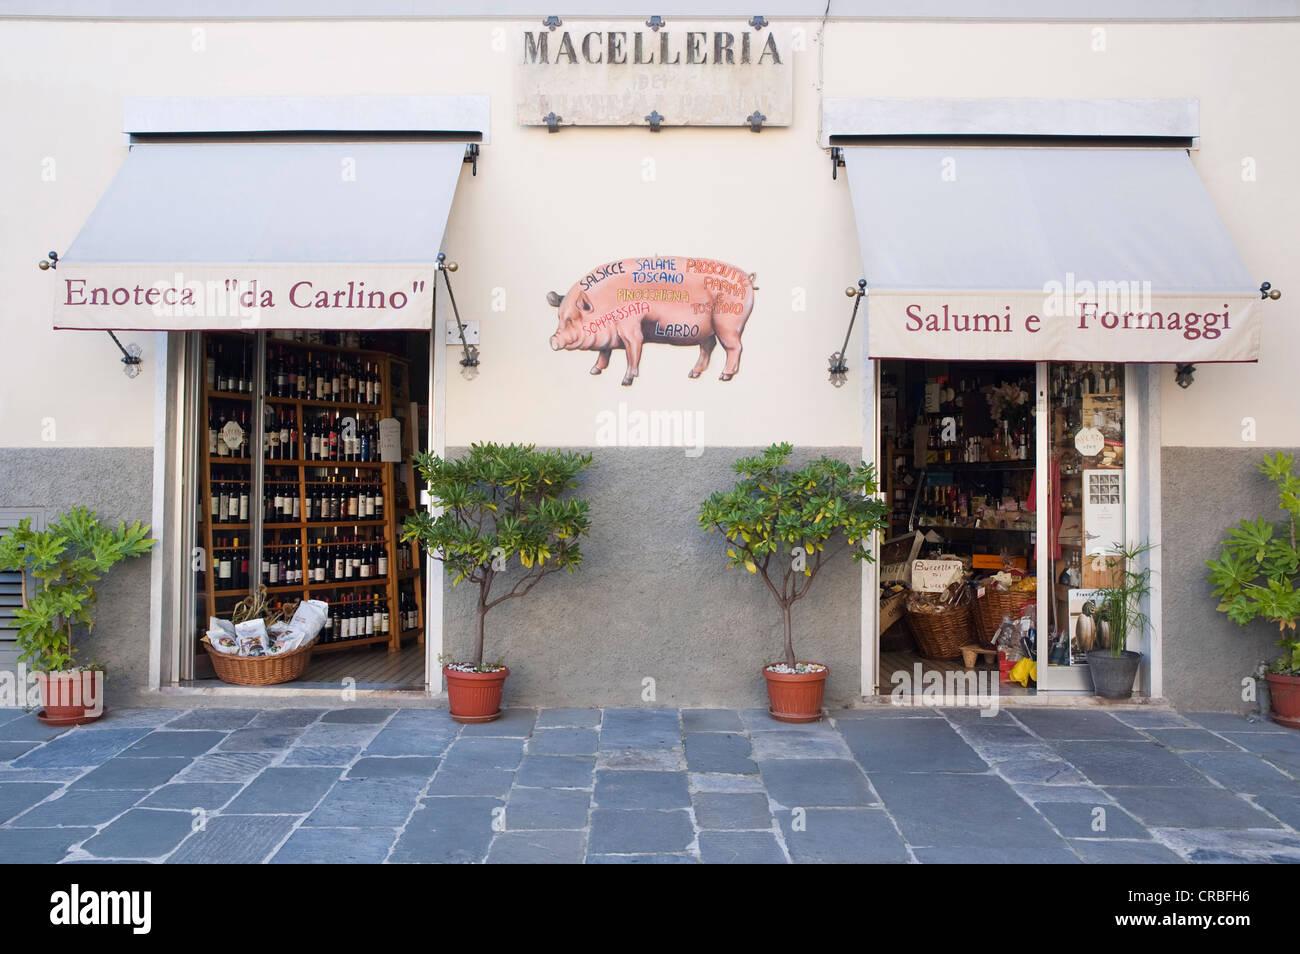 Enoteca 'da Carlino, delicatessen, Pietrasanta, Tuscany, Italy, Europe - Stock Image